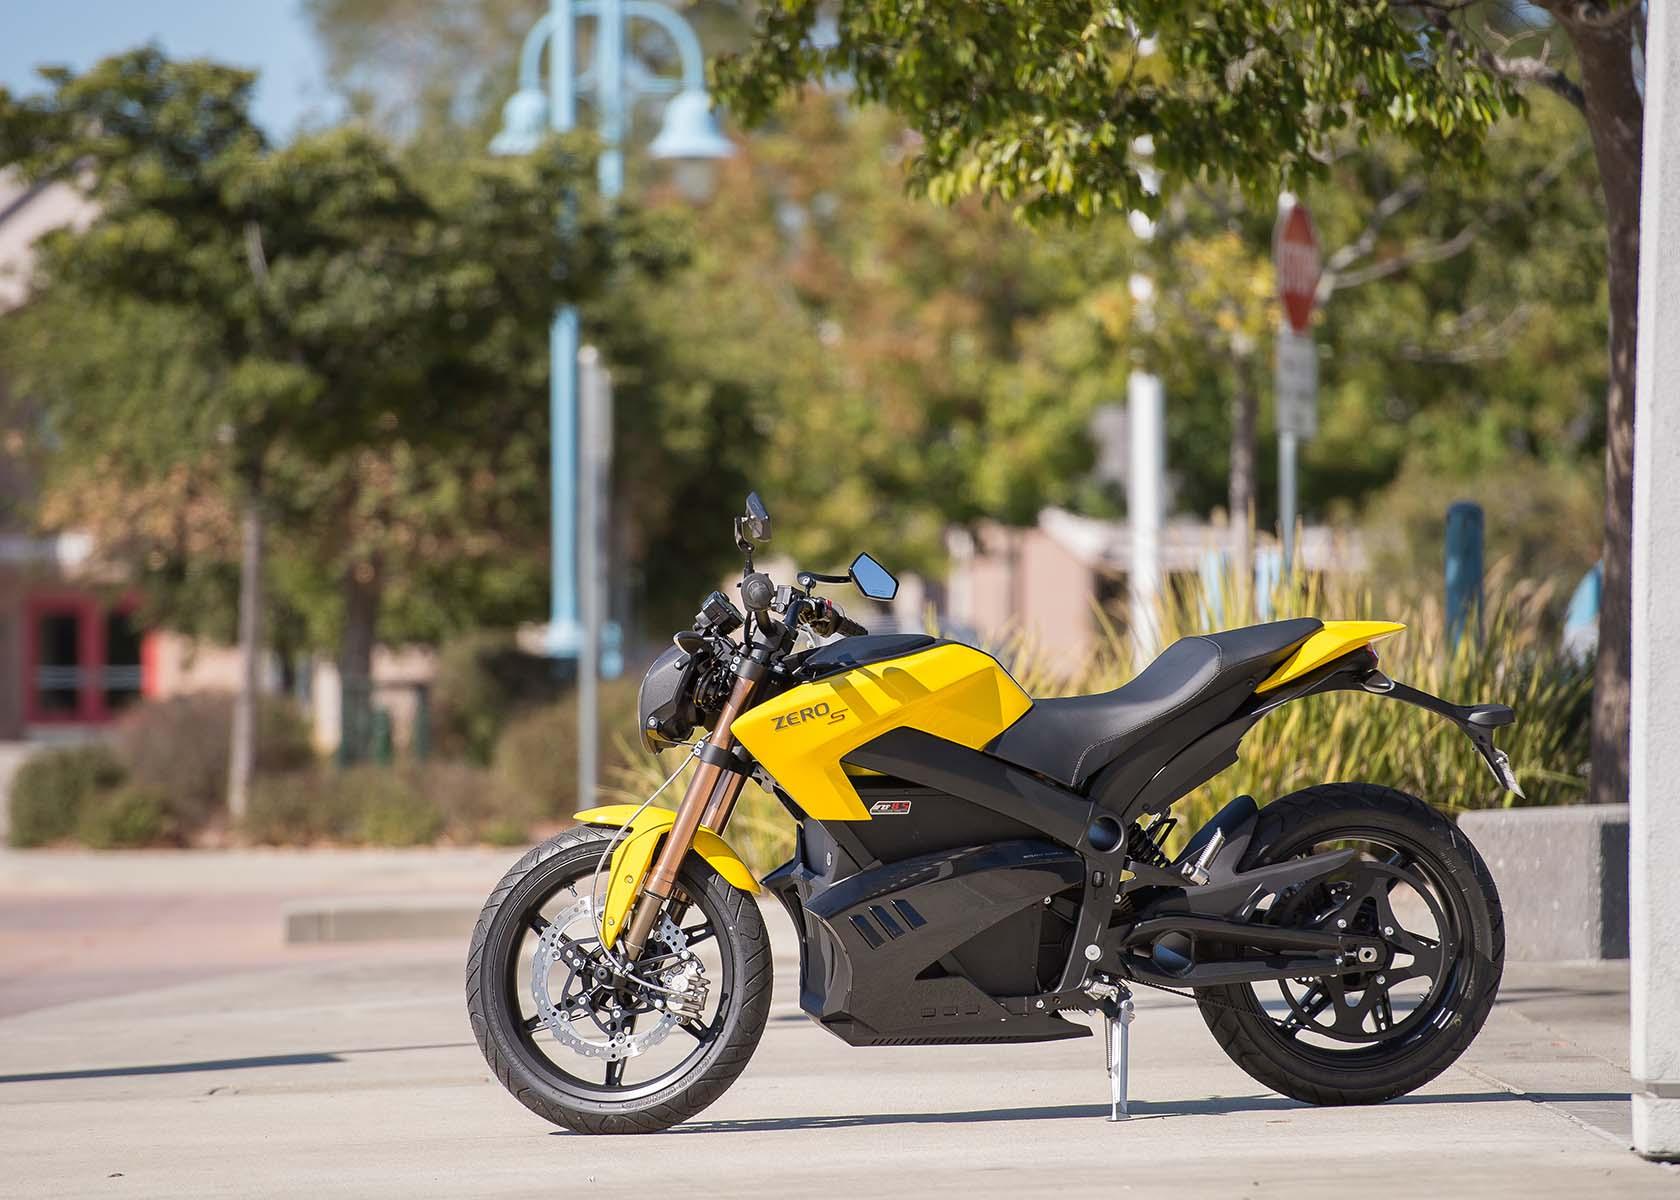 2013 zero motorcycles 137 city miles 54 horsepower asphalt rubber. Black Bedroom Furniture Sets. Home Design Ideas